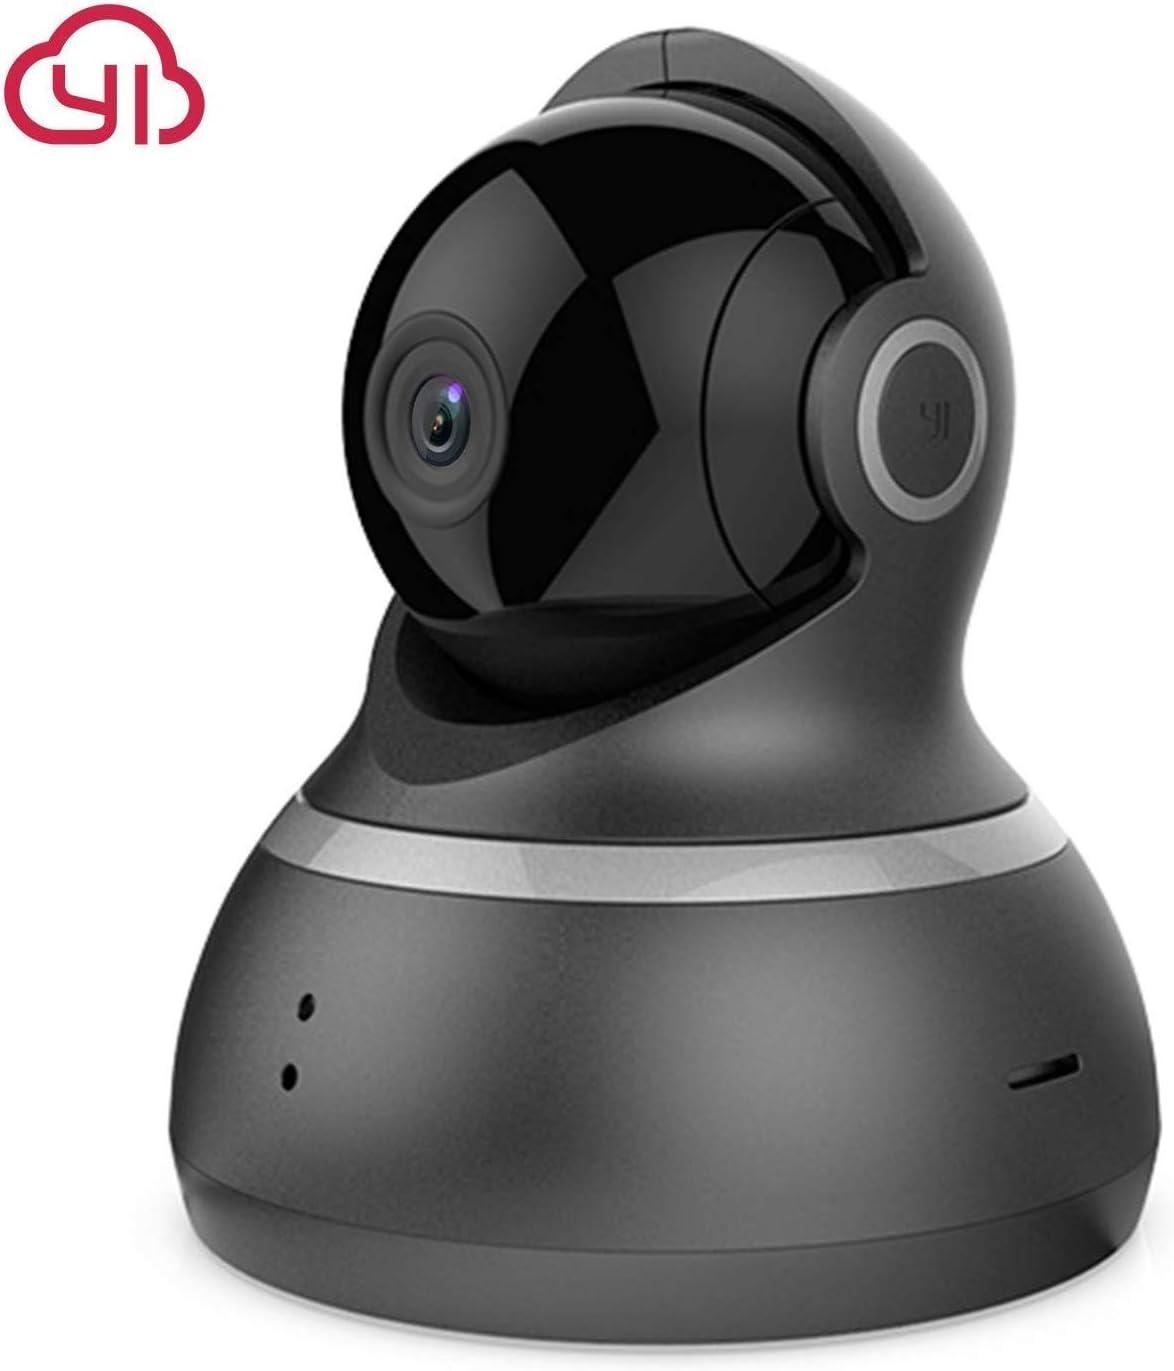 1080p HD Indoor Pan//Tilt//Zoom Wireless IP Security Surveillance YI Dome Camera